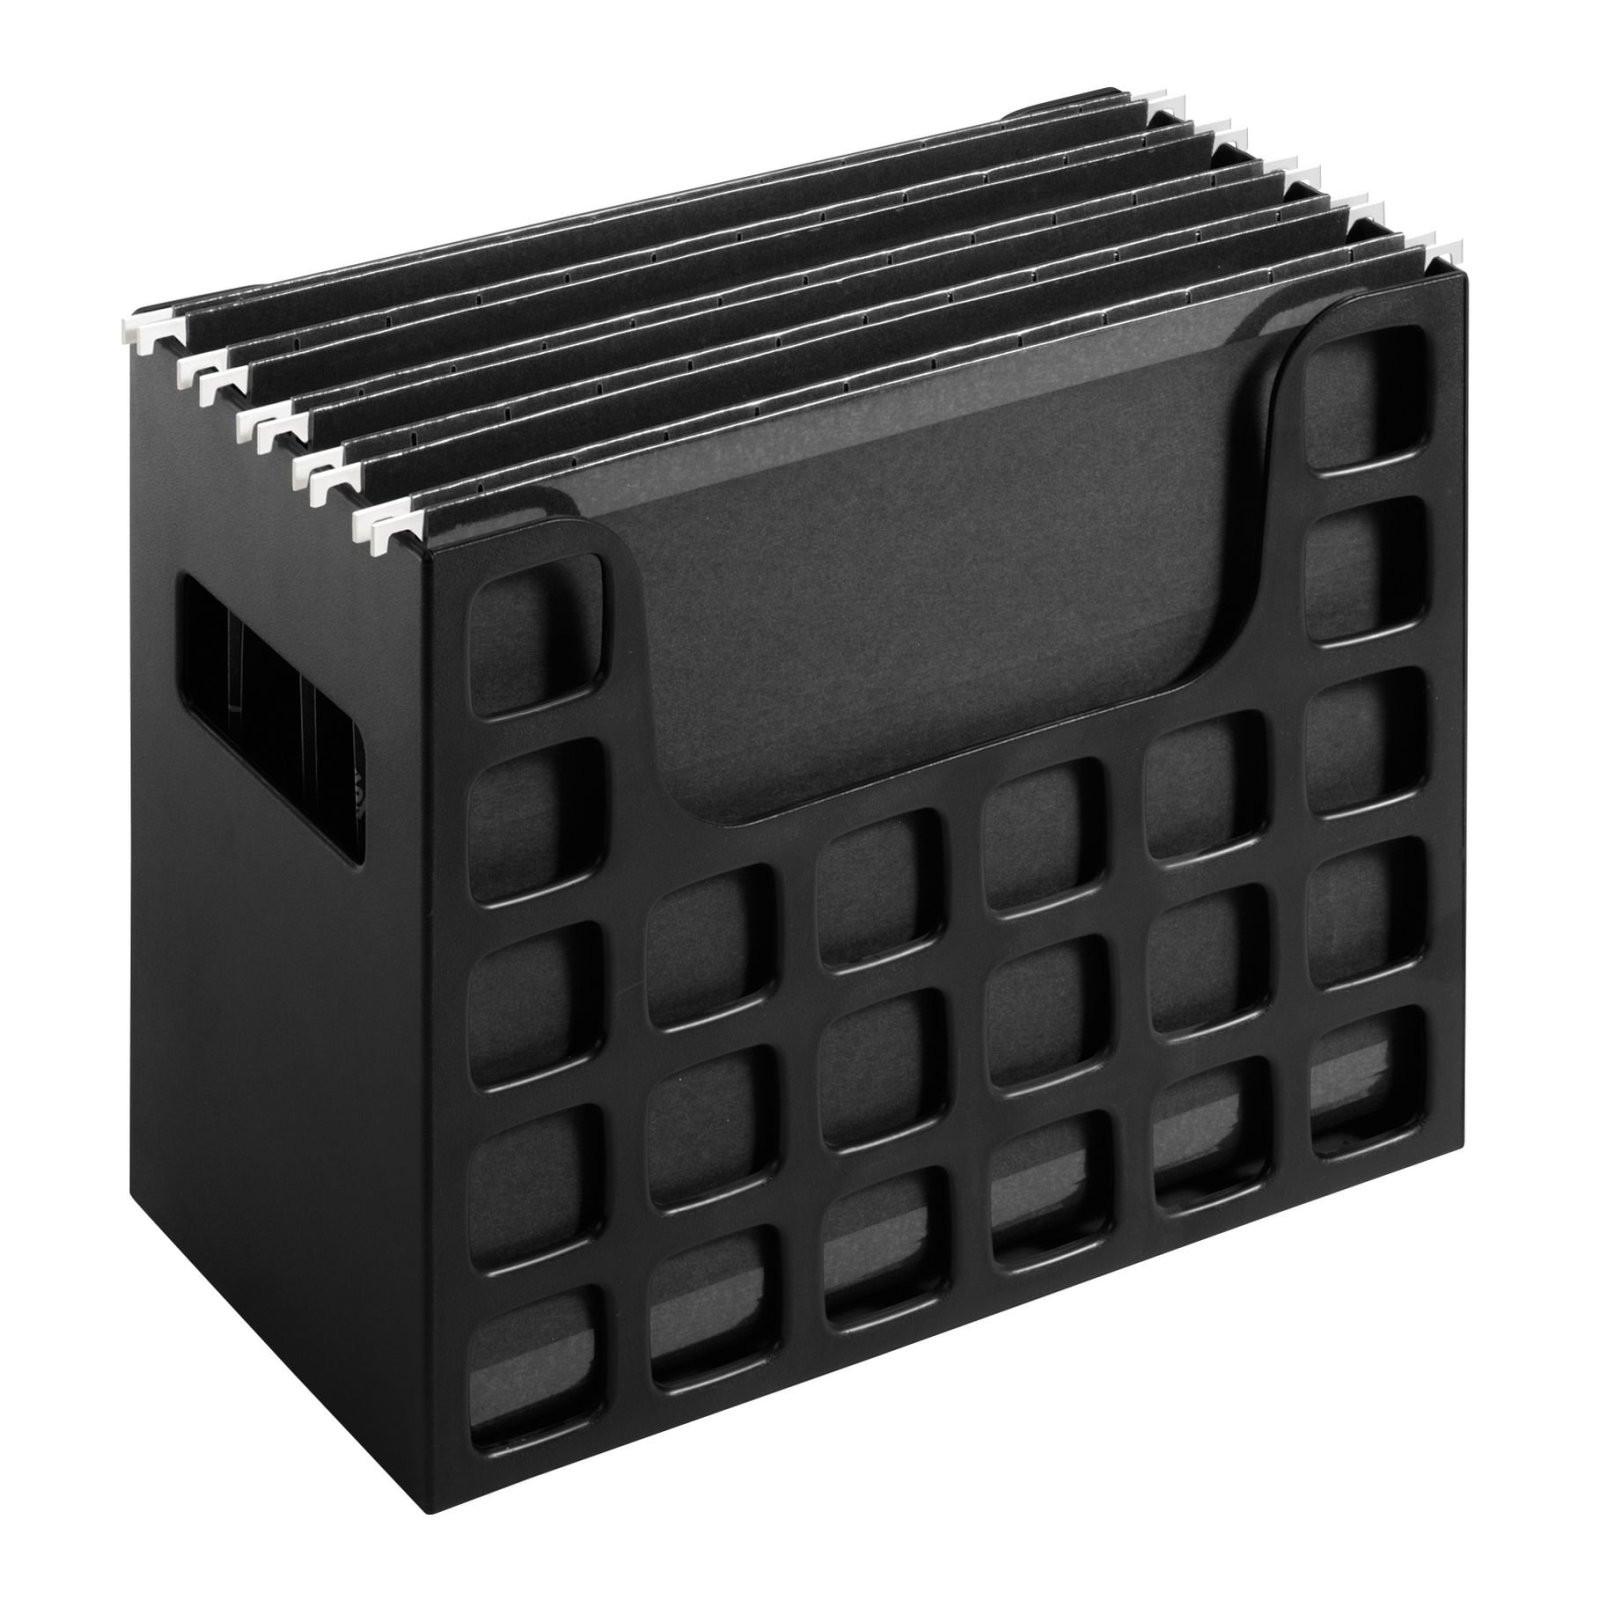 Desktop File Folder Organizer  Desktop File Box Hanging Folder Organizer Storage Rack